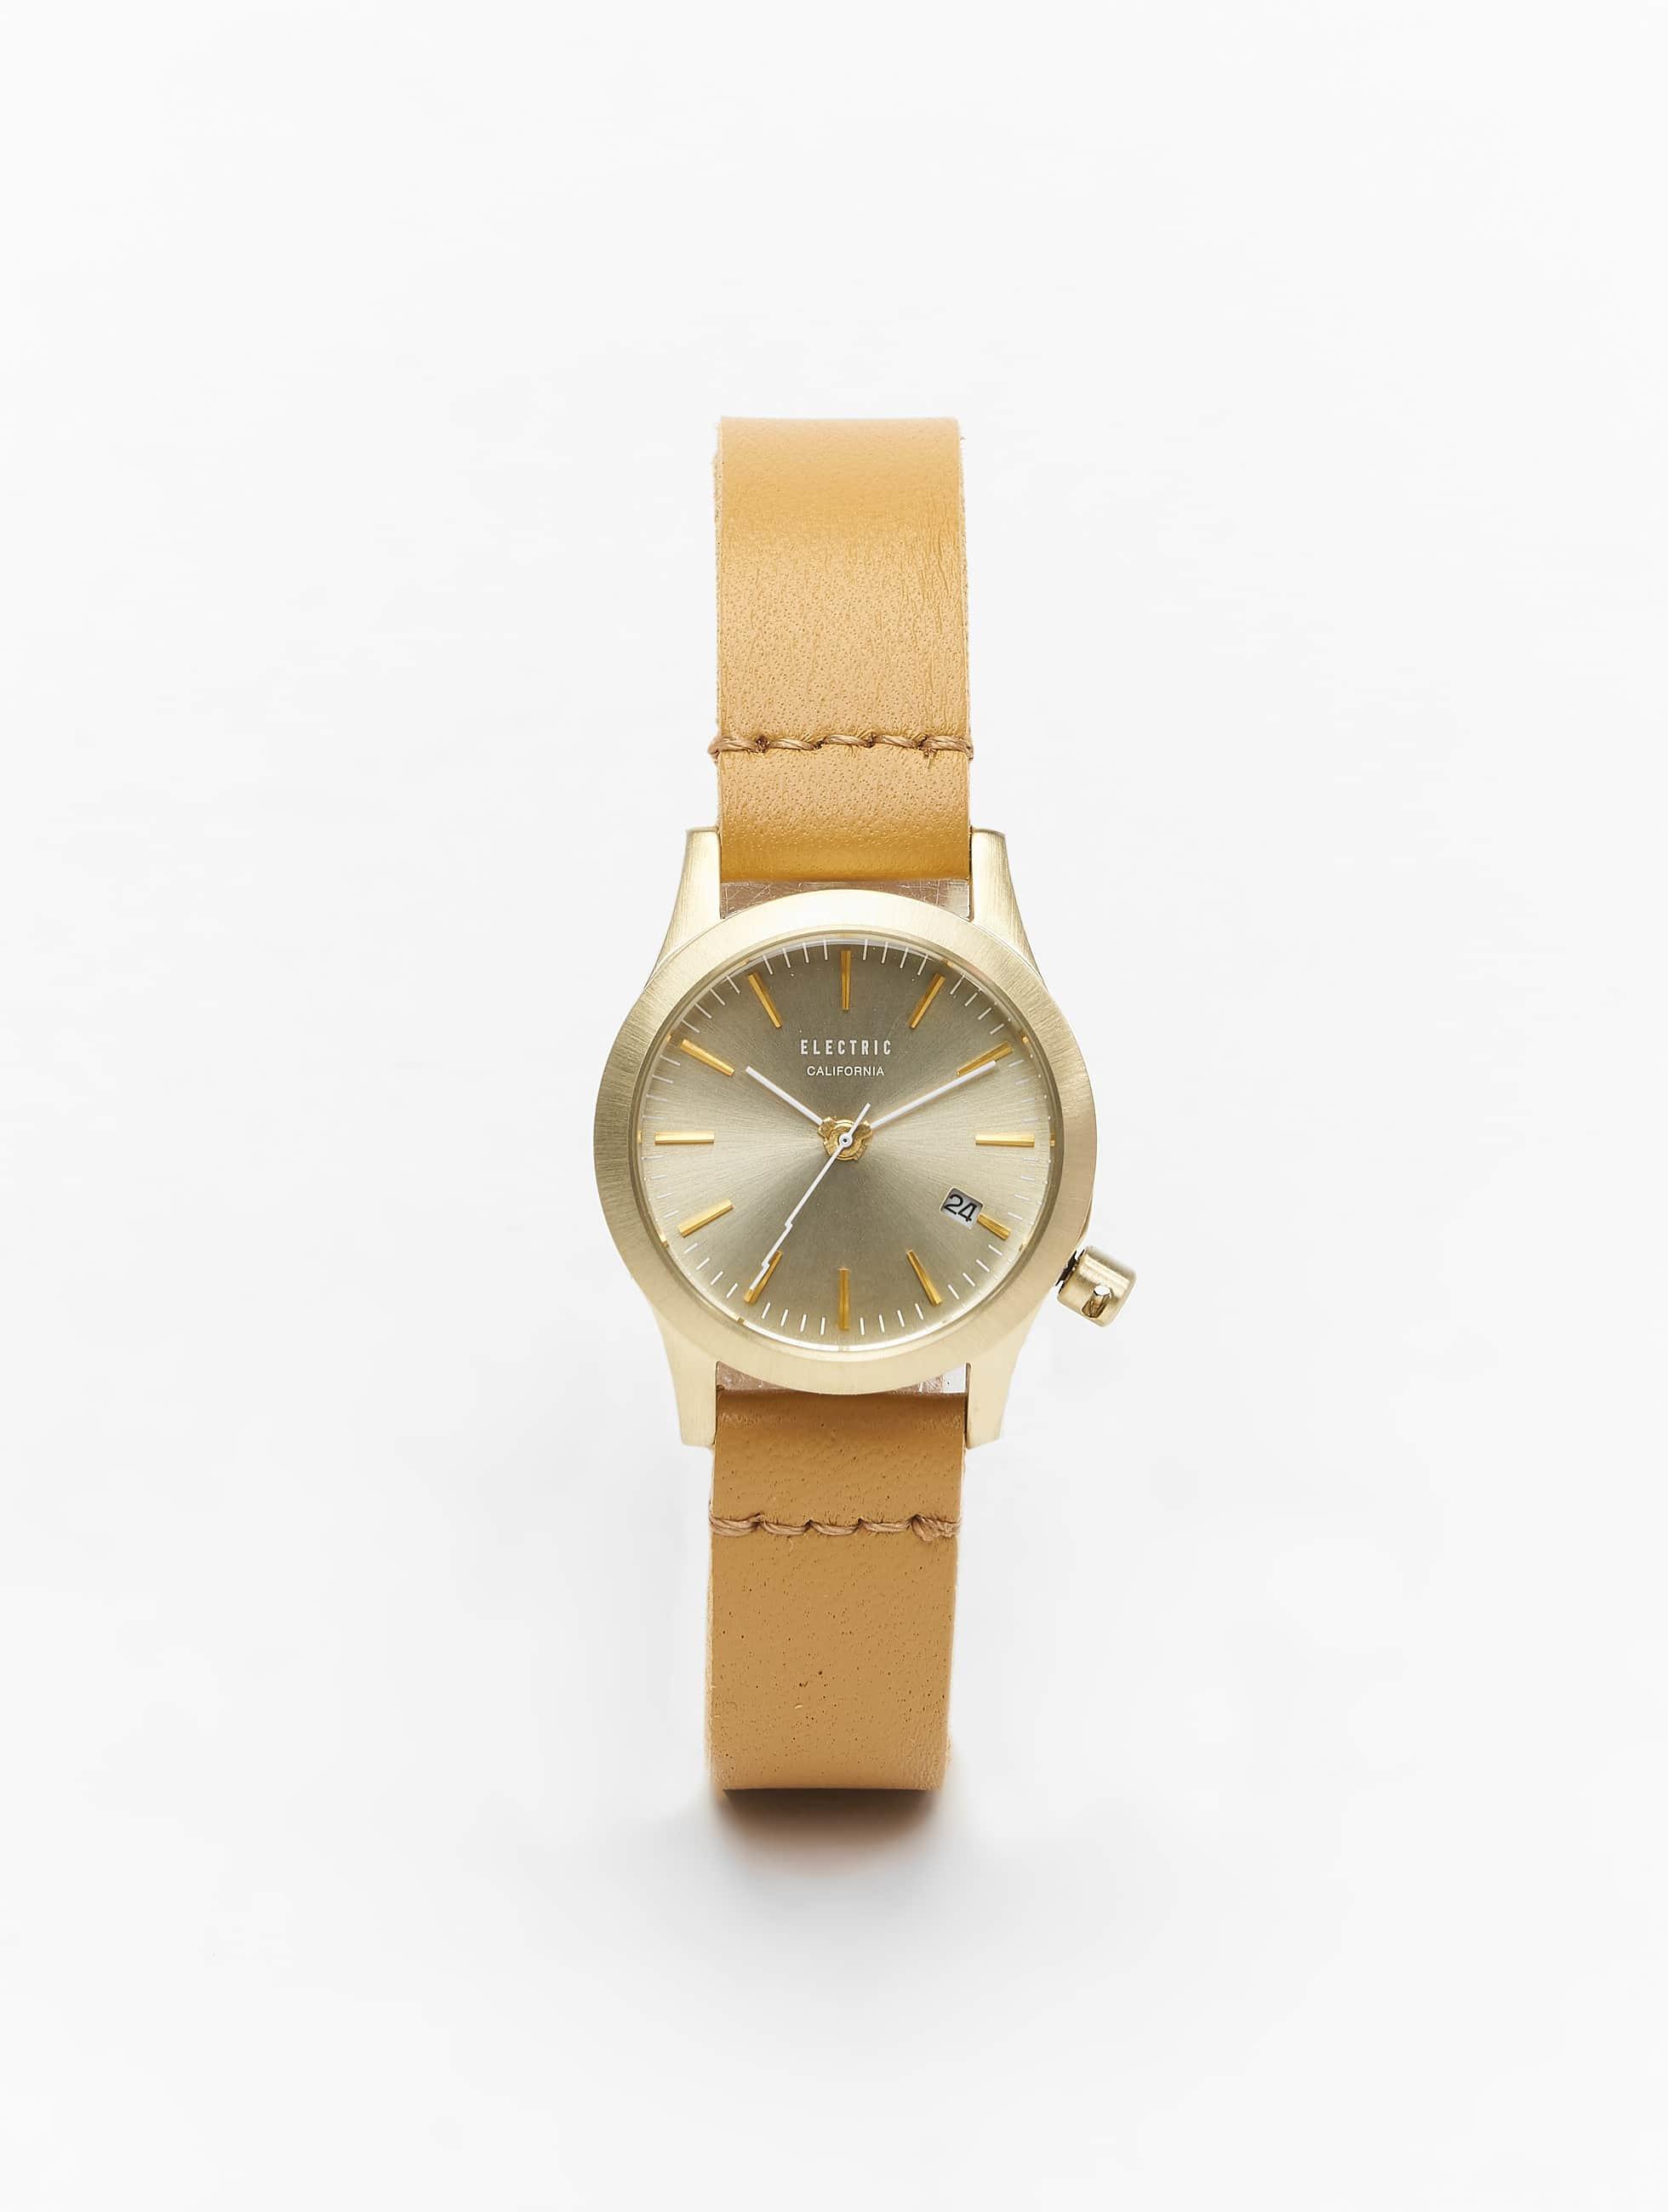 Electric Часы FW03 MINI коричневый